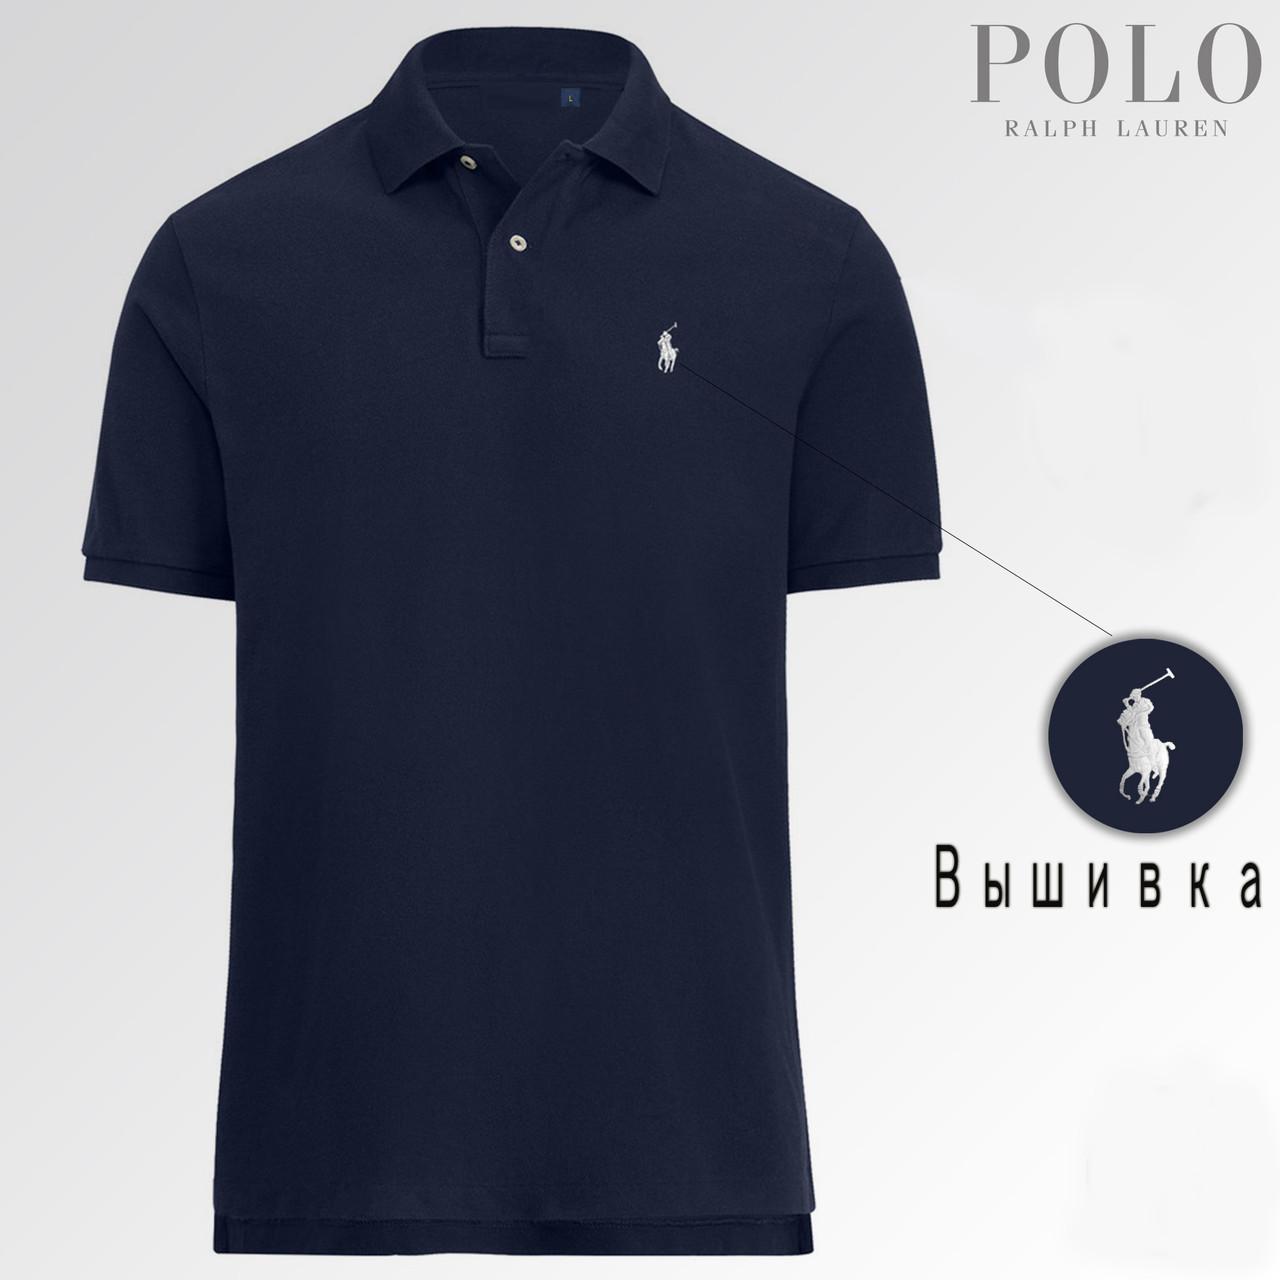 Футболка поло polo Ralph Lauren темно-синяя  вышивка логотип реплика, фото 1